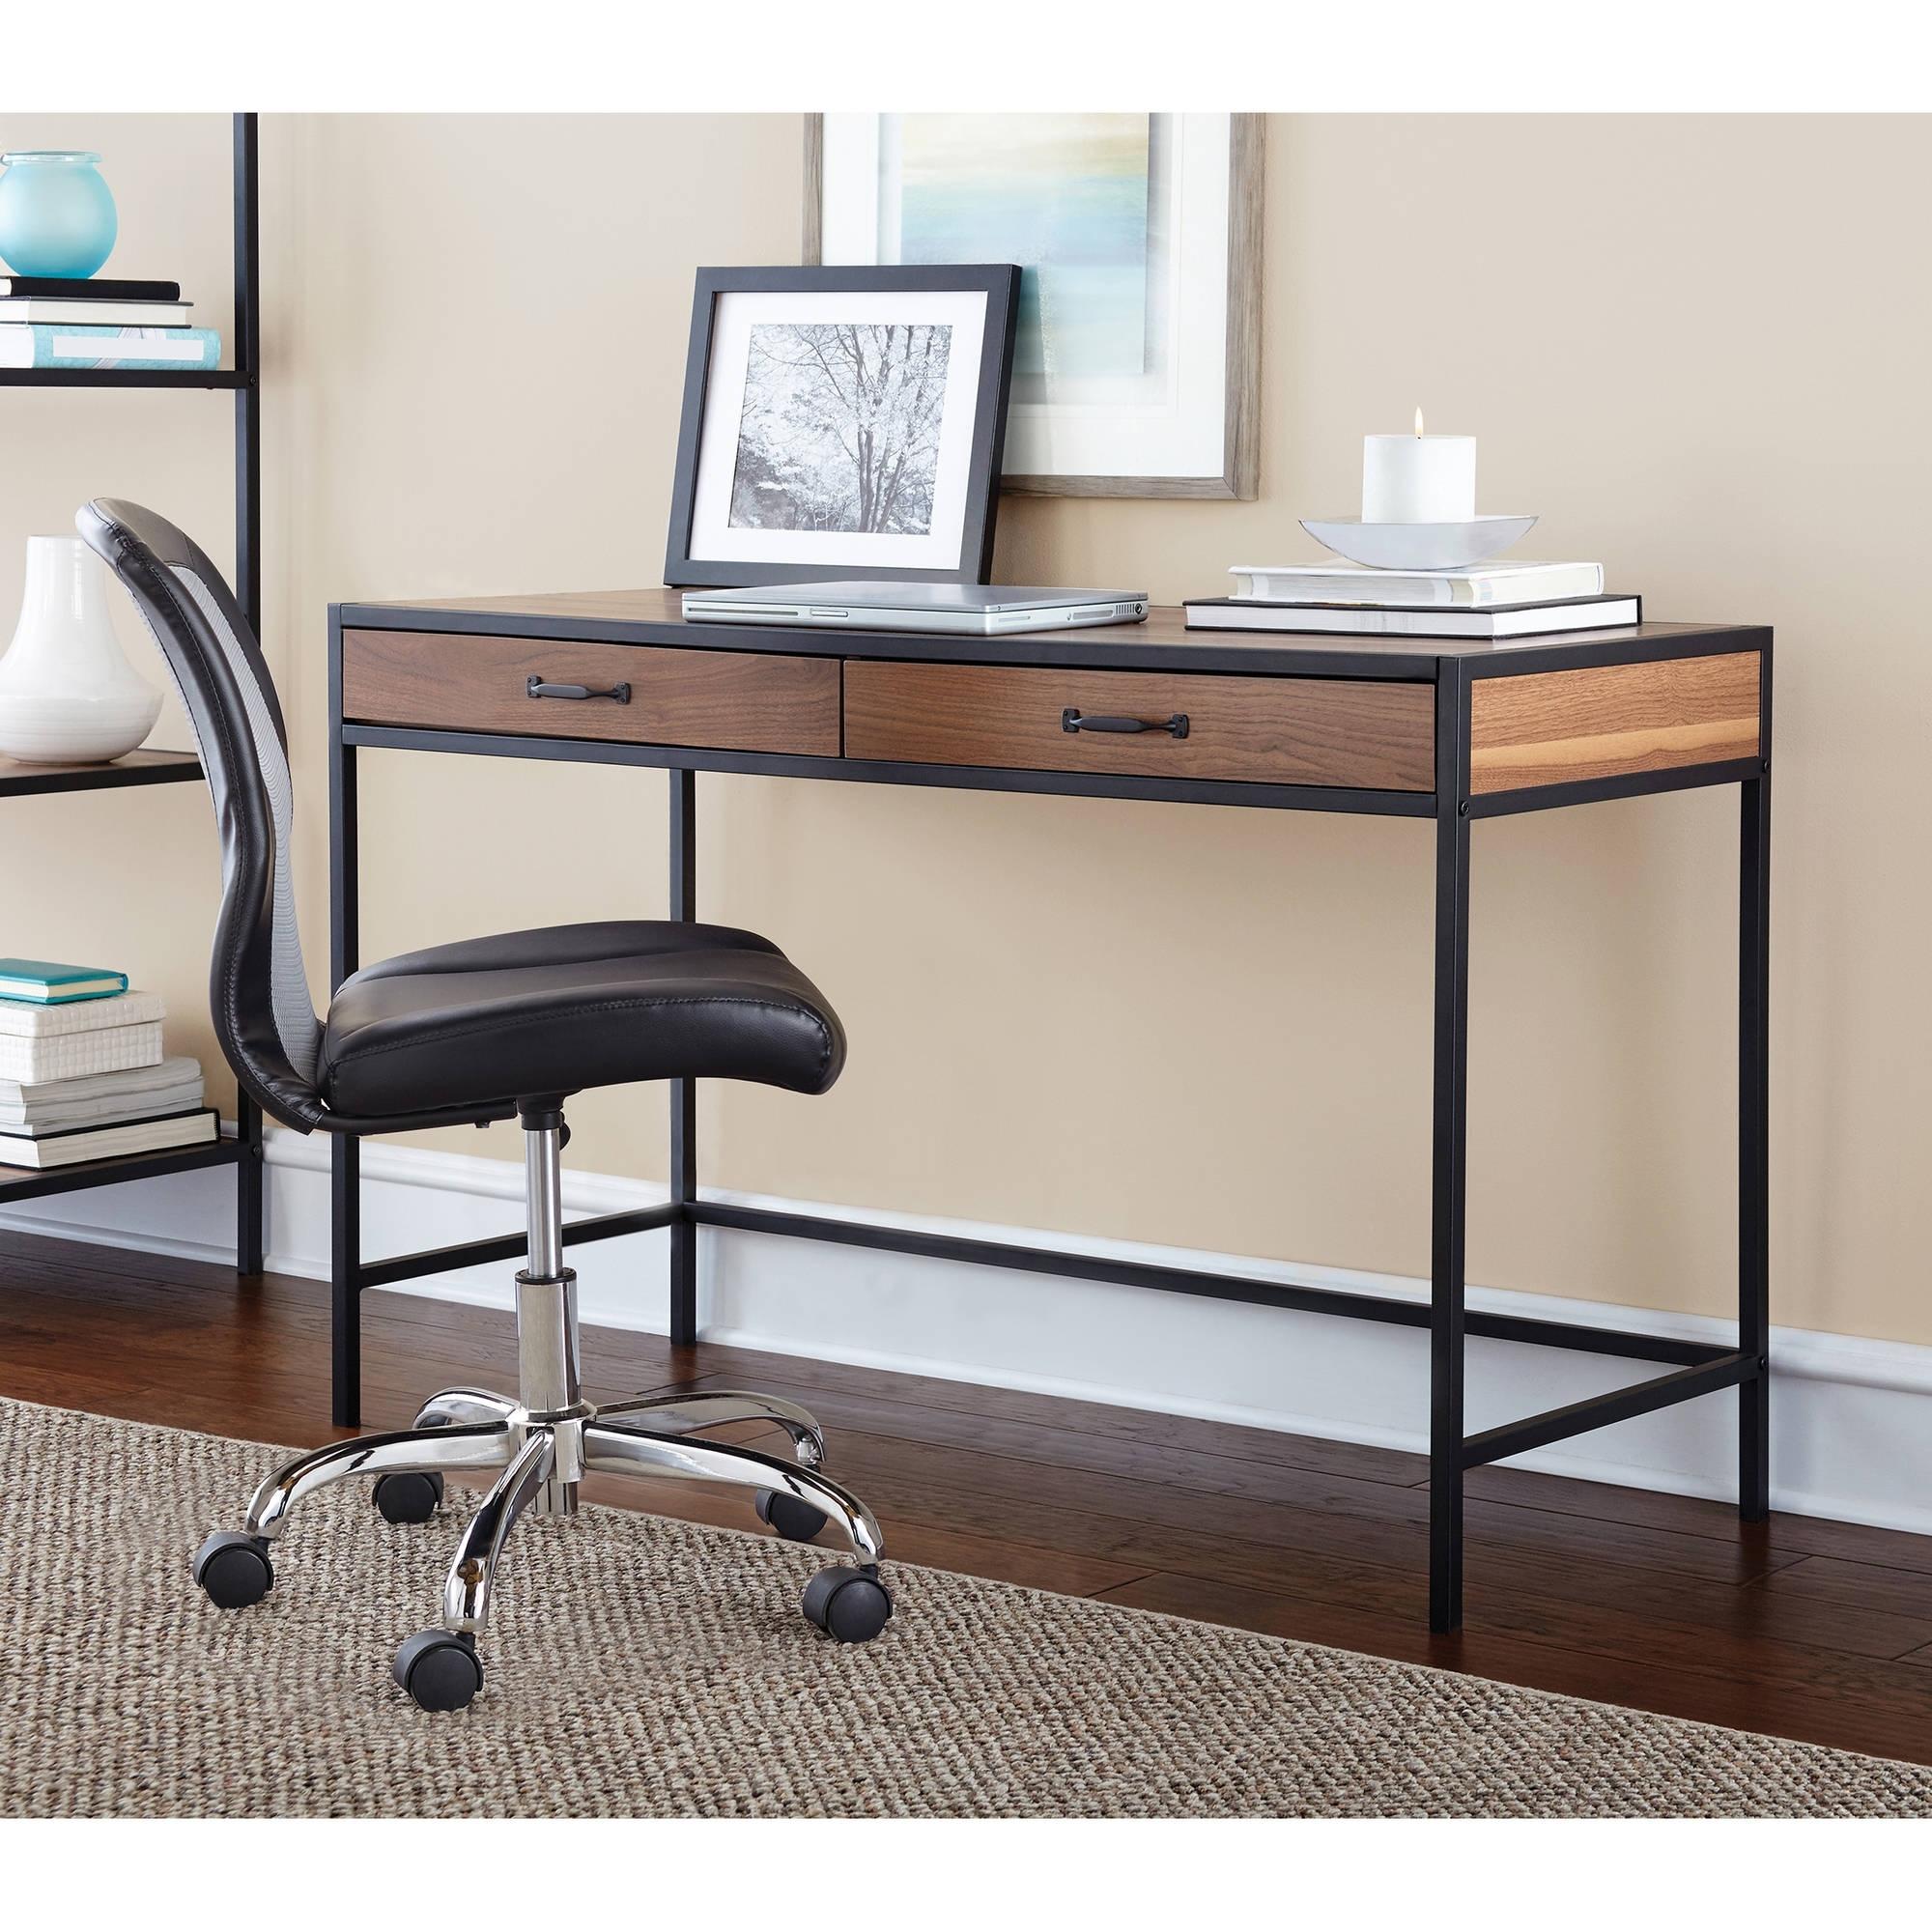 2018 Computer Desks At Walmart In Mainstays Metro Desk, Multiple Finishes – Walmart (View 18 of 20)